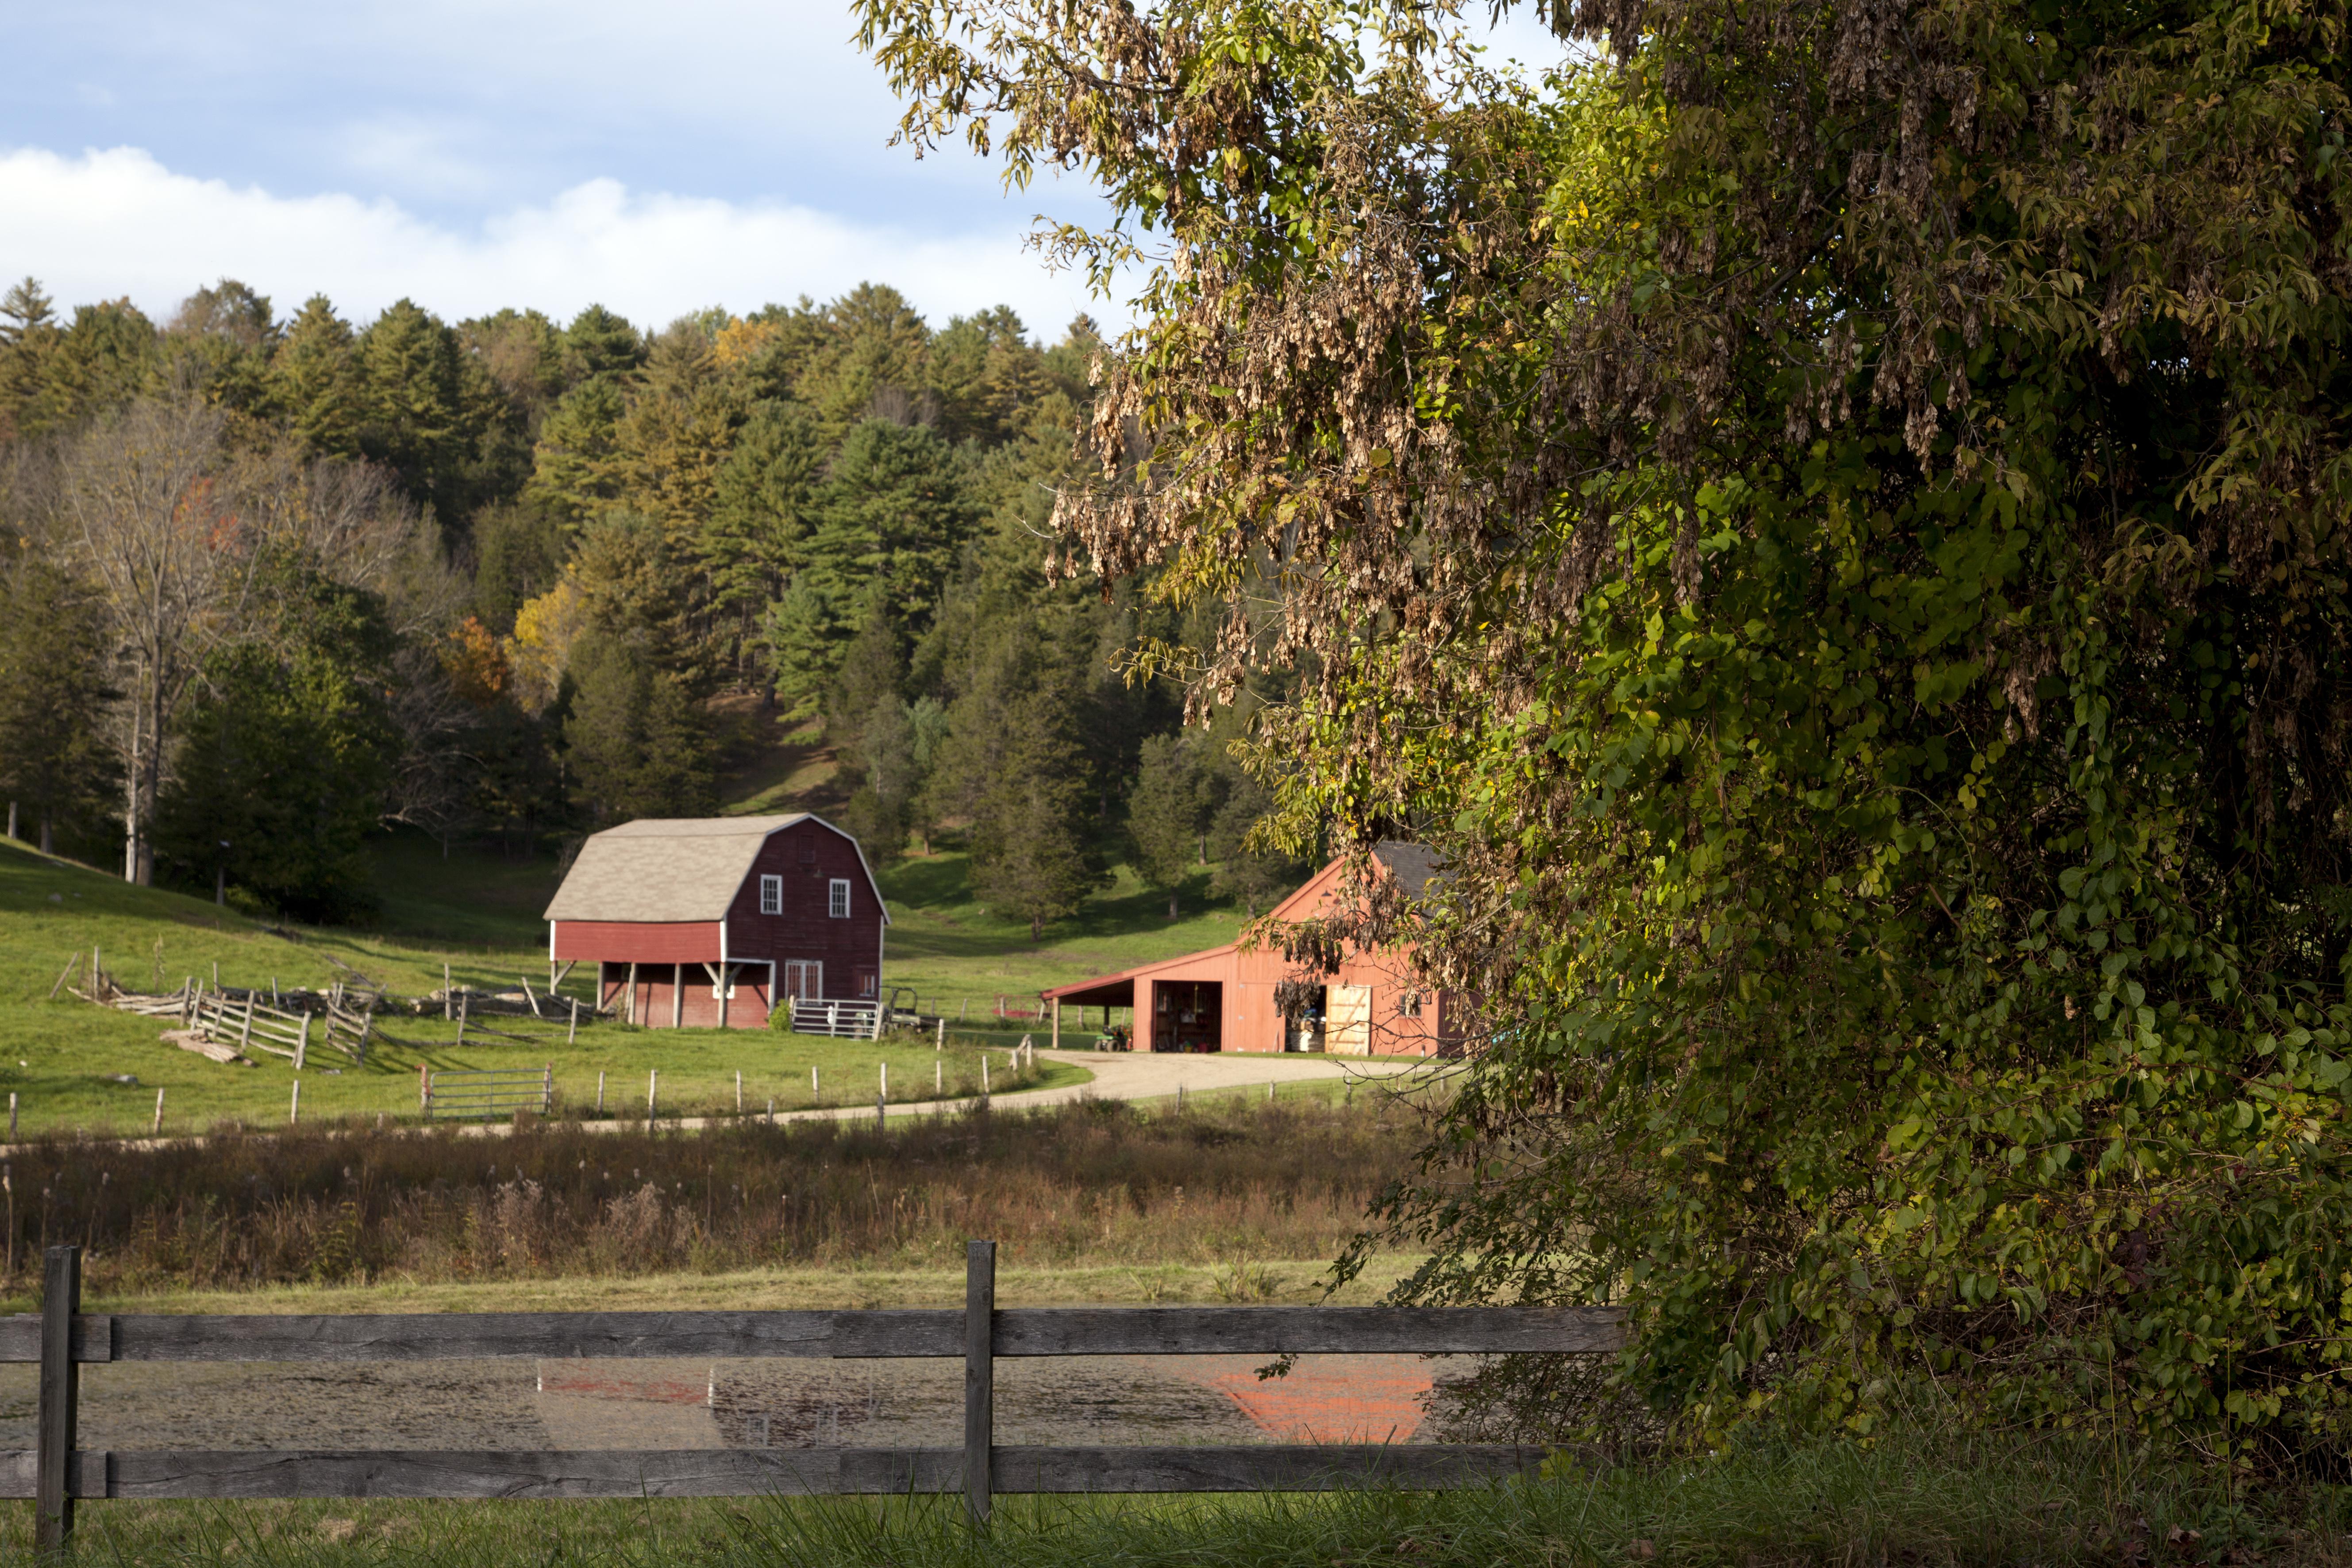 Barn in Falls Village, Connecticut